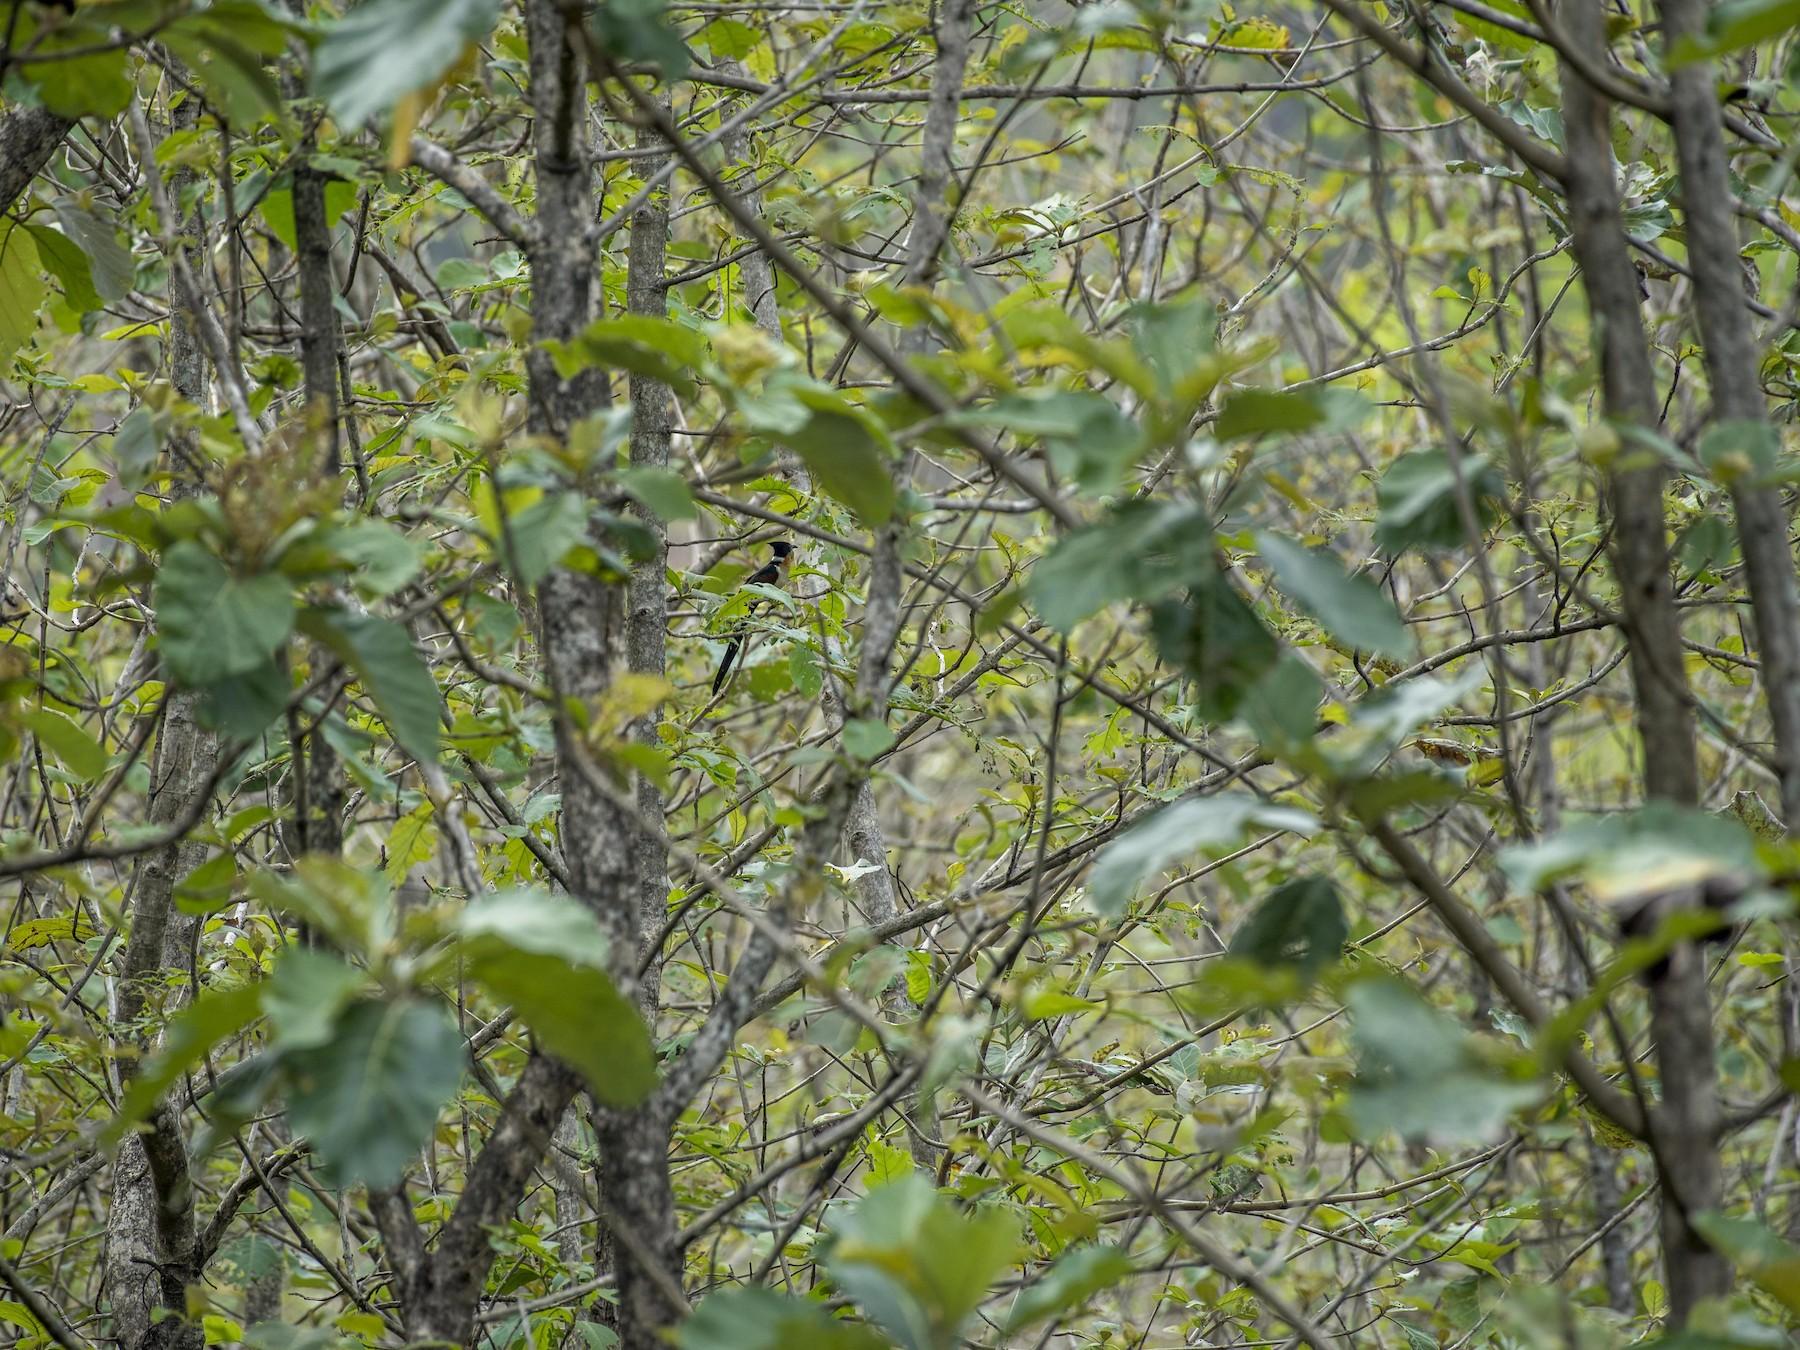 Chestnut-winged Cuckoo - Venugopala Prabhu S